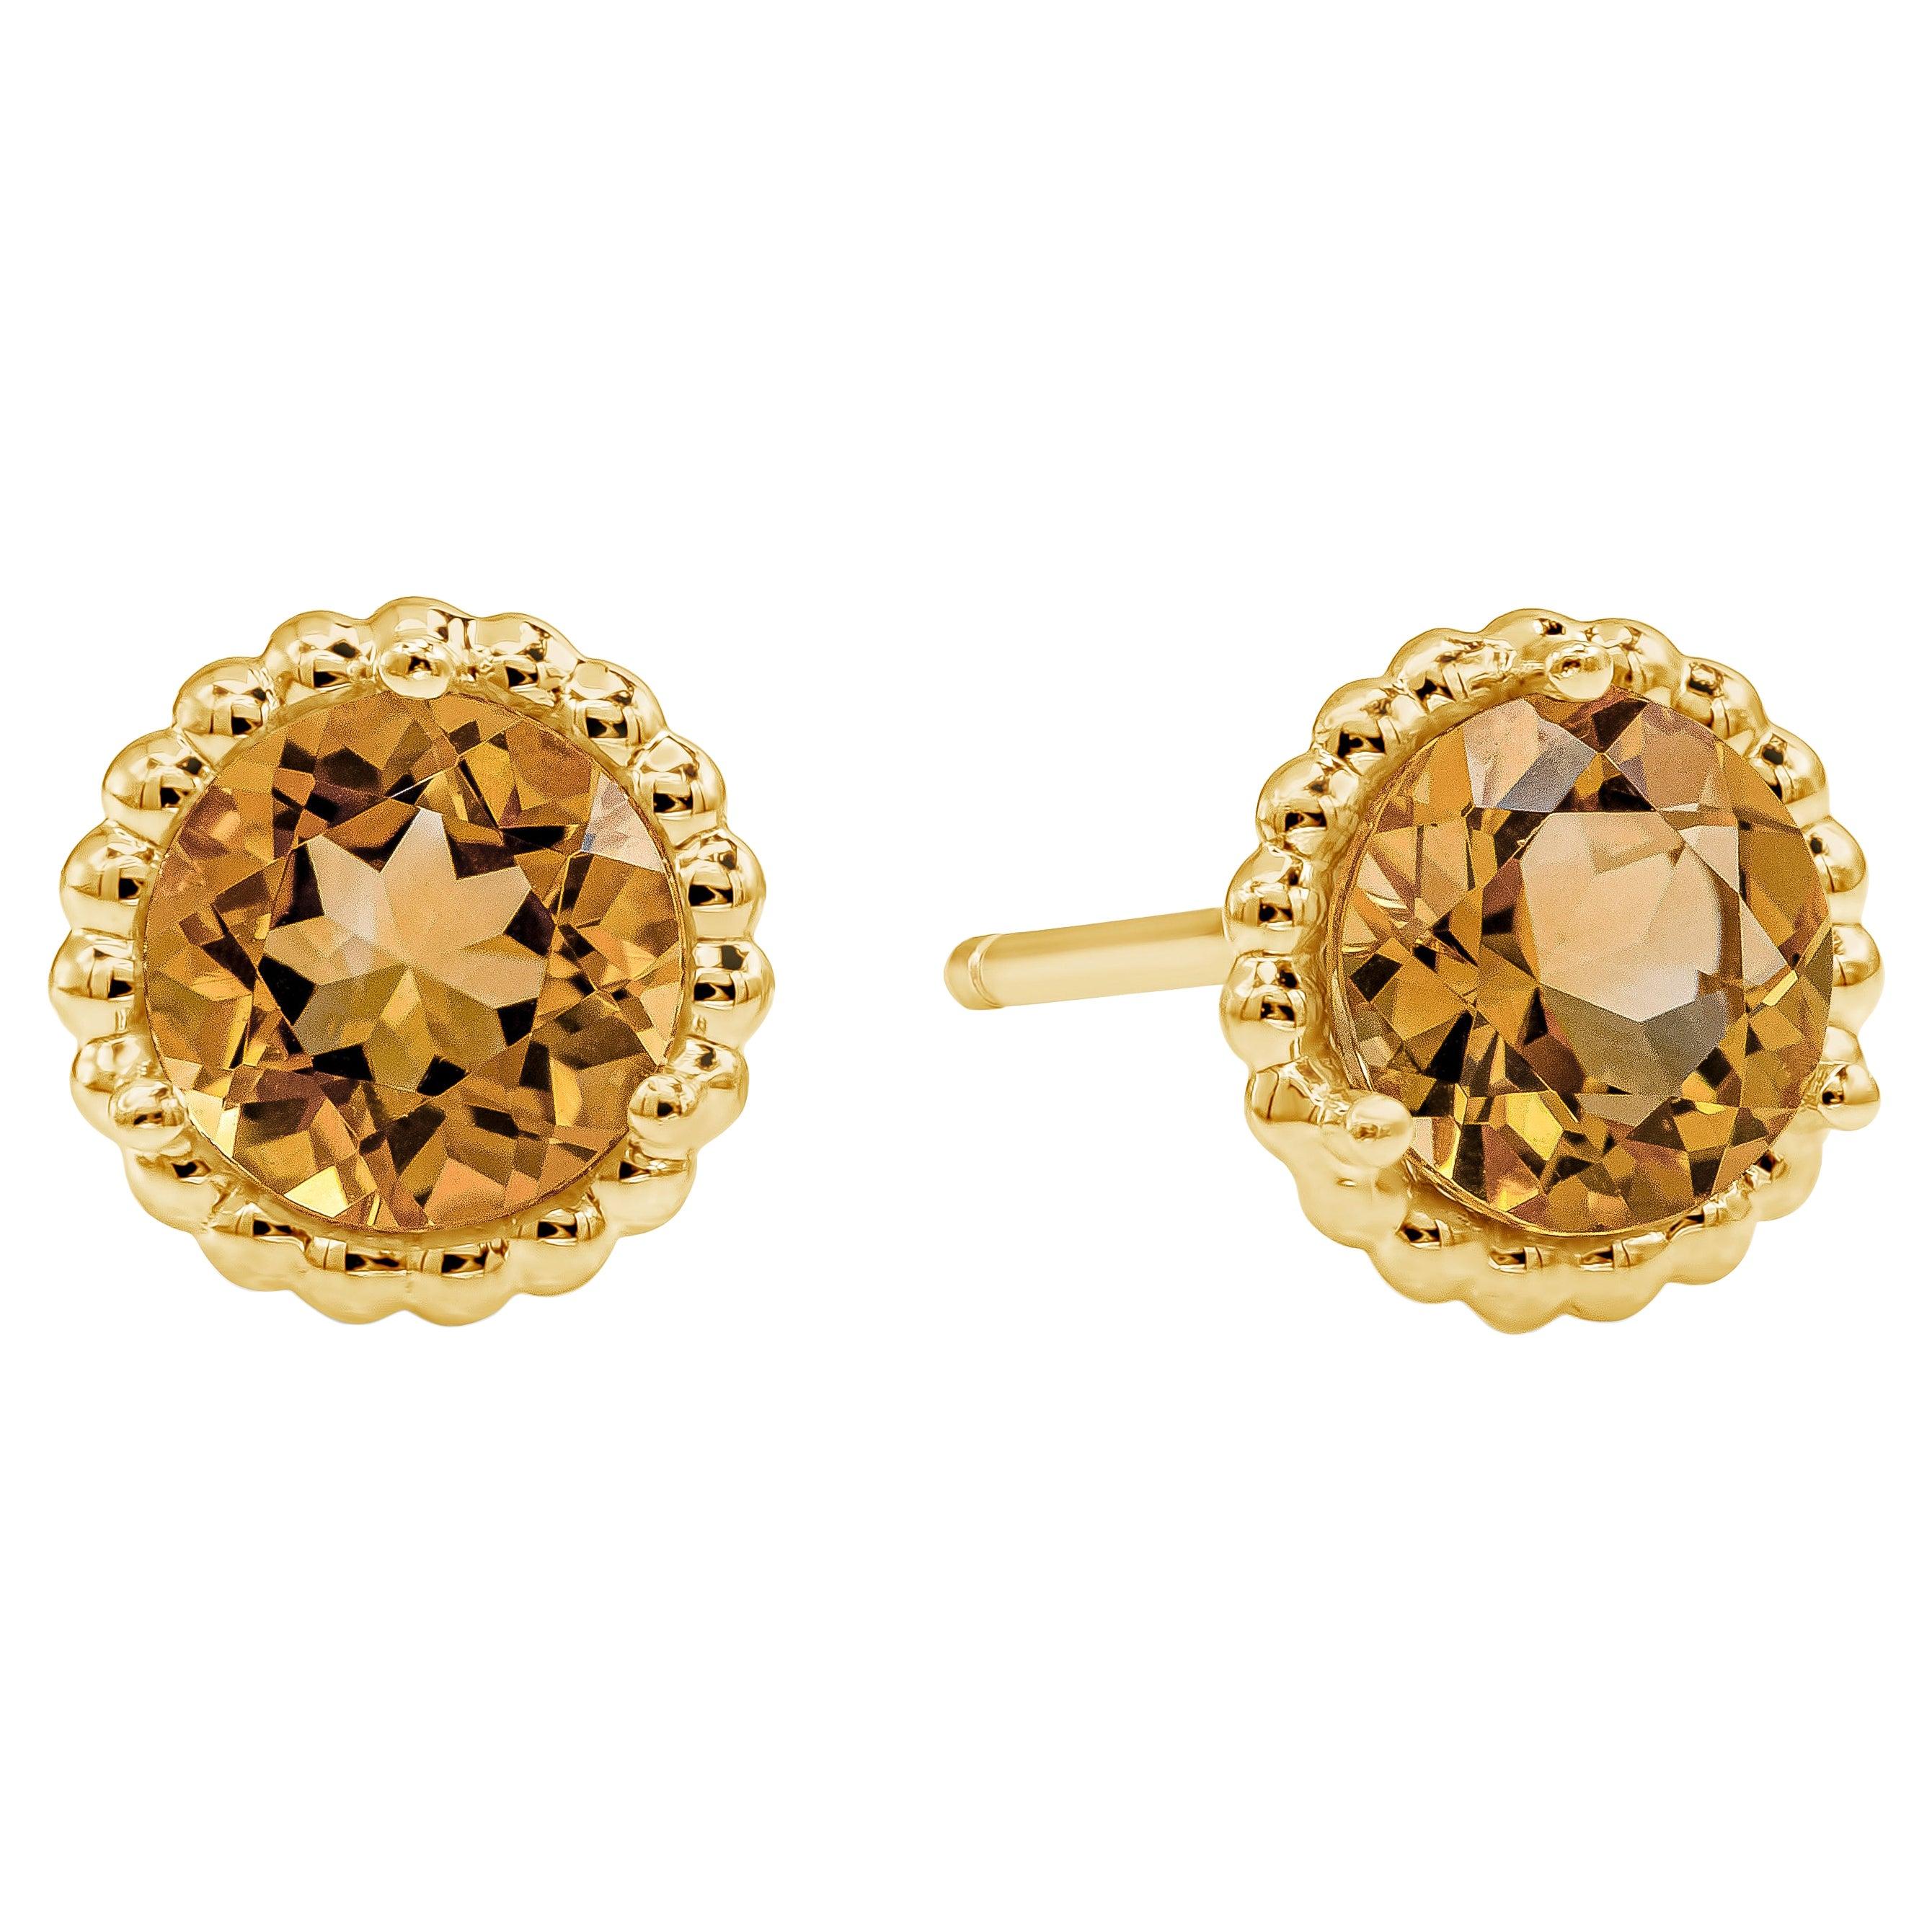 Tiffany & Co. Orange Citrine Beaded Stud Earrings in 18k Yellow Gold